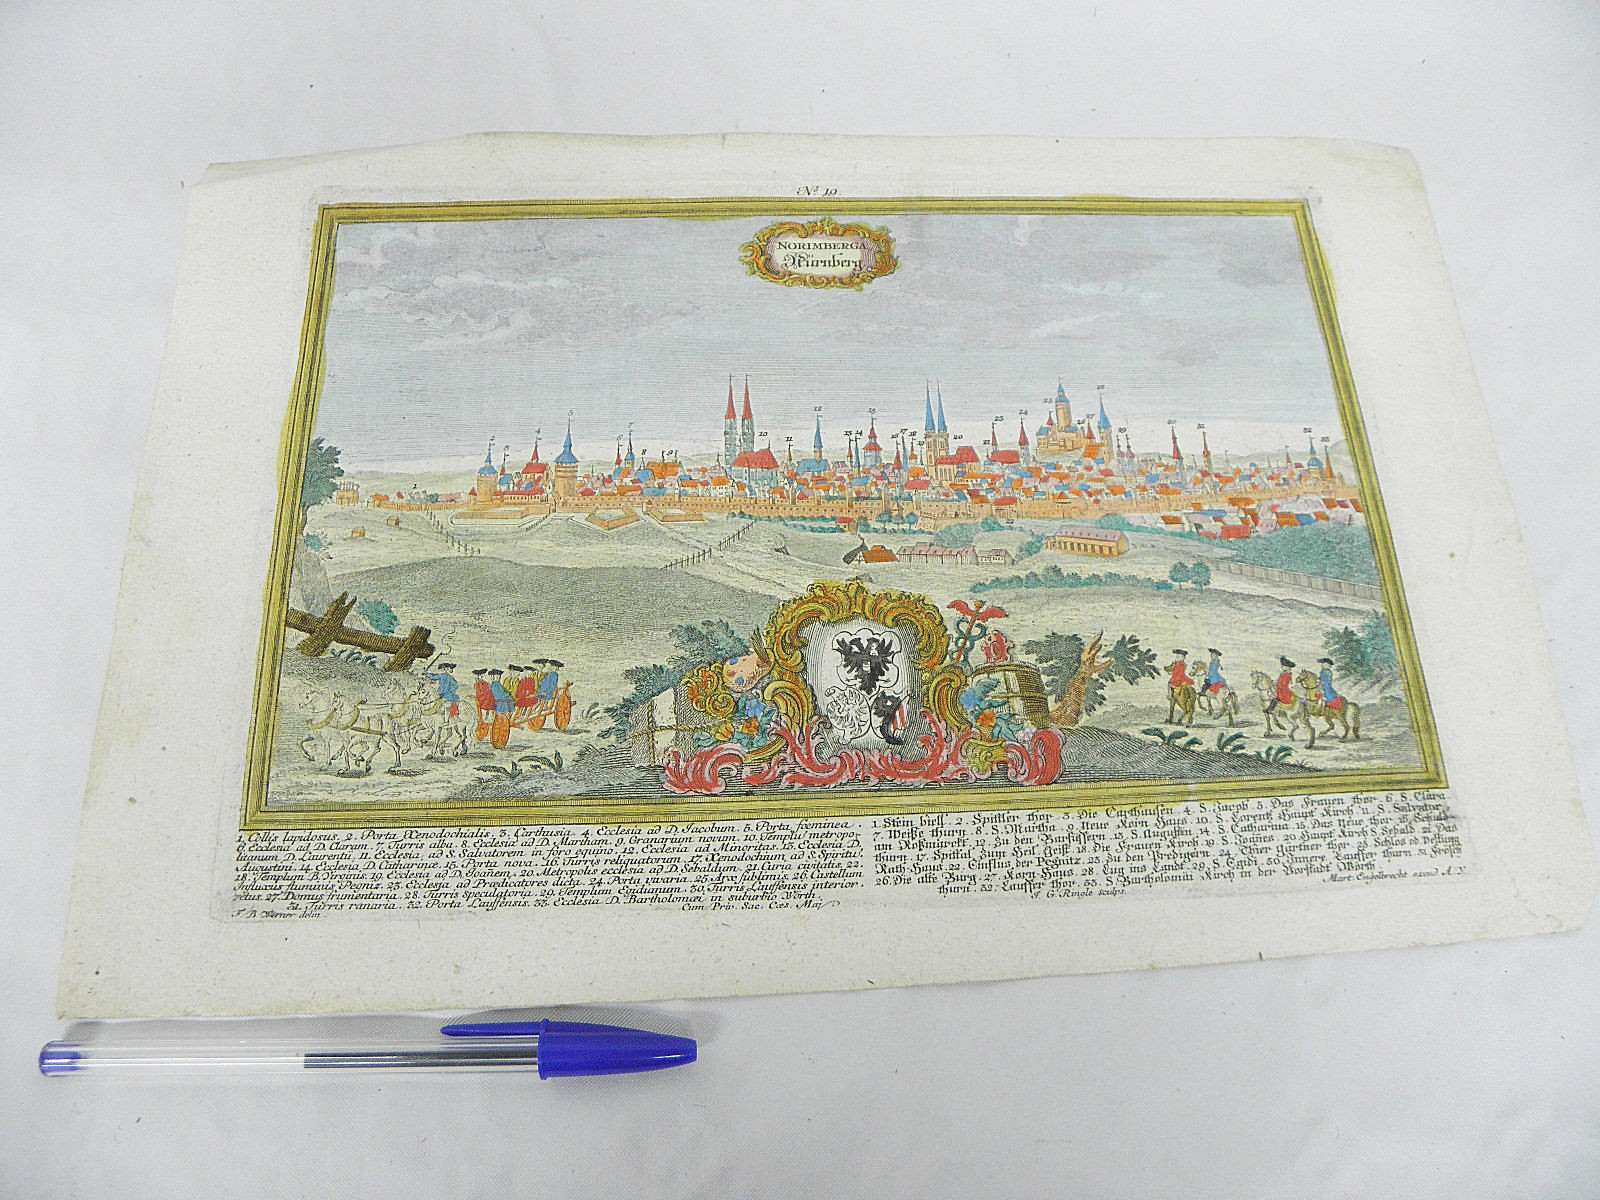 LCOL-NORIMBERGA-NURNBERG